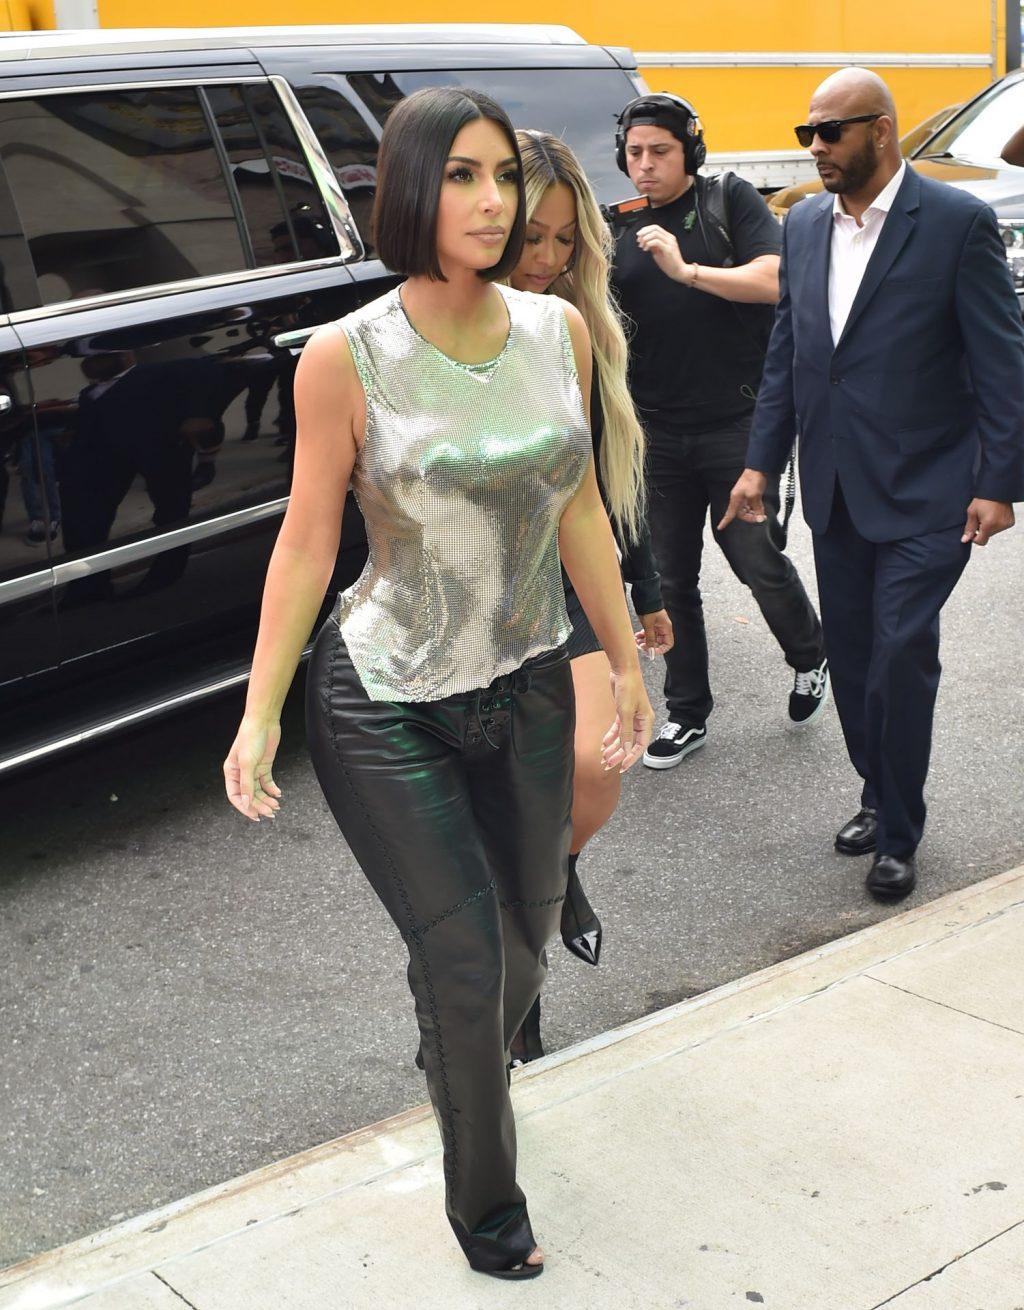 Uncategorized 2019 : Kim Kardashian arrives at a fashion show in New York during New York Fashion Week 2019-51